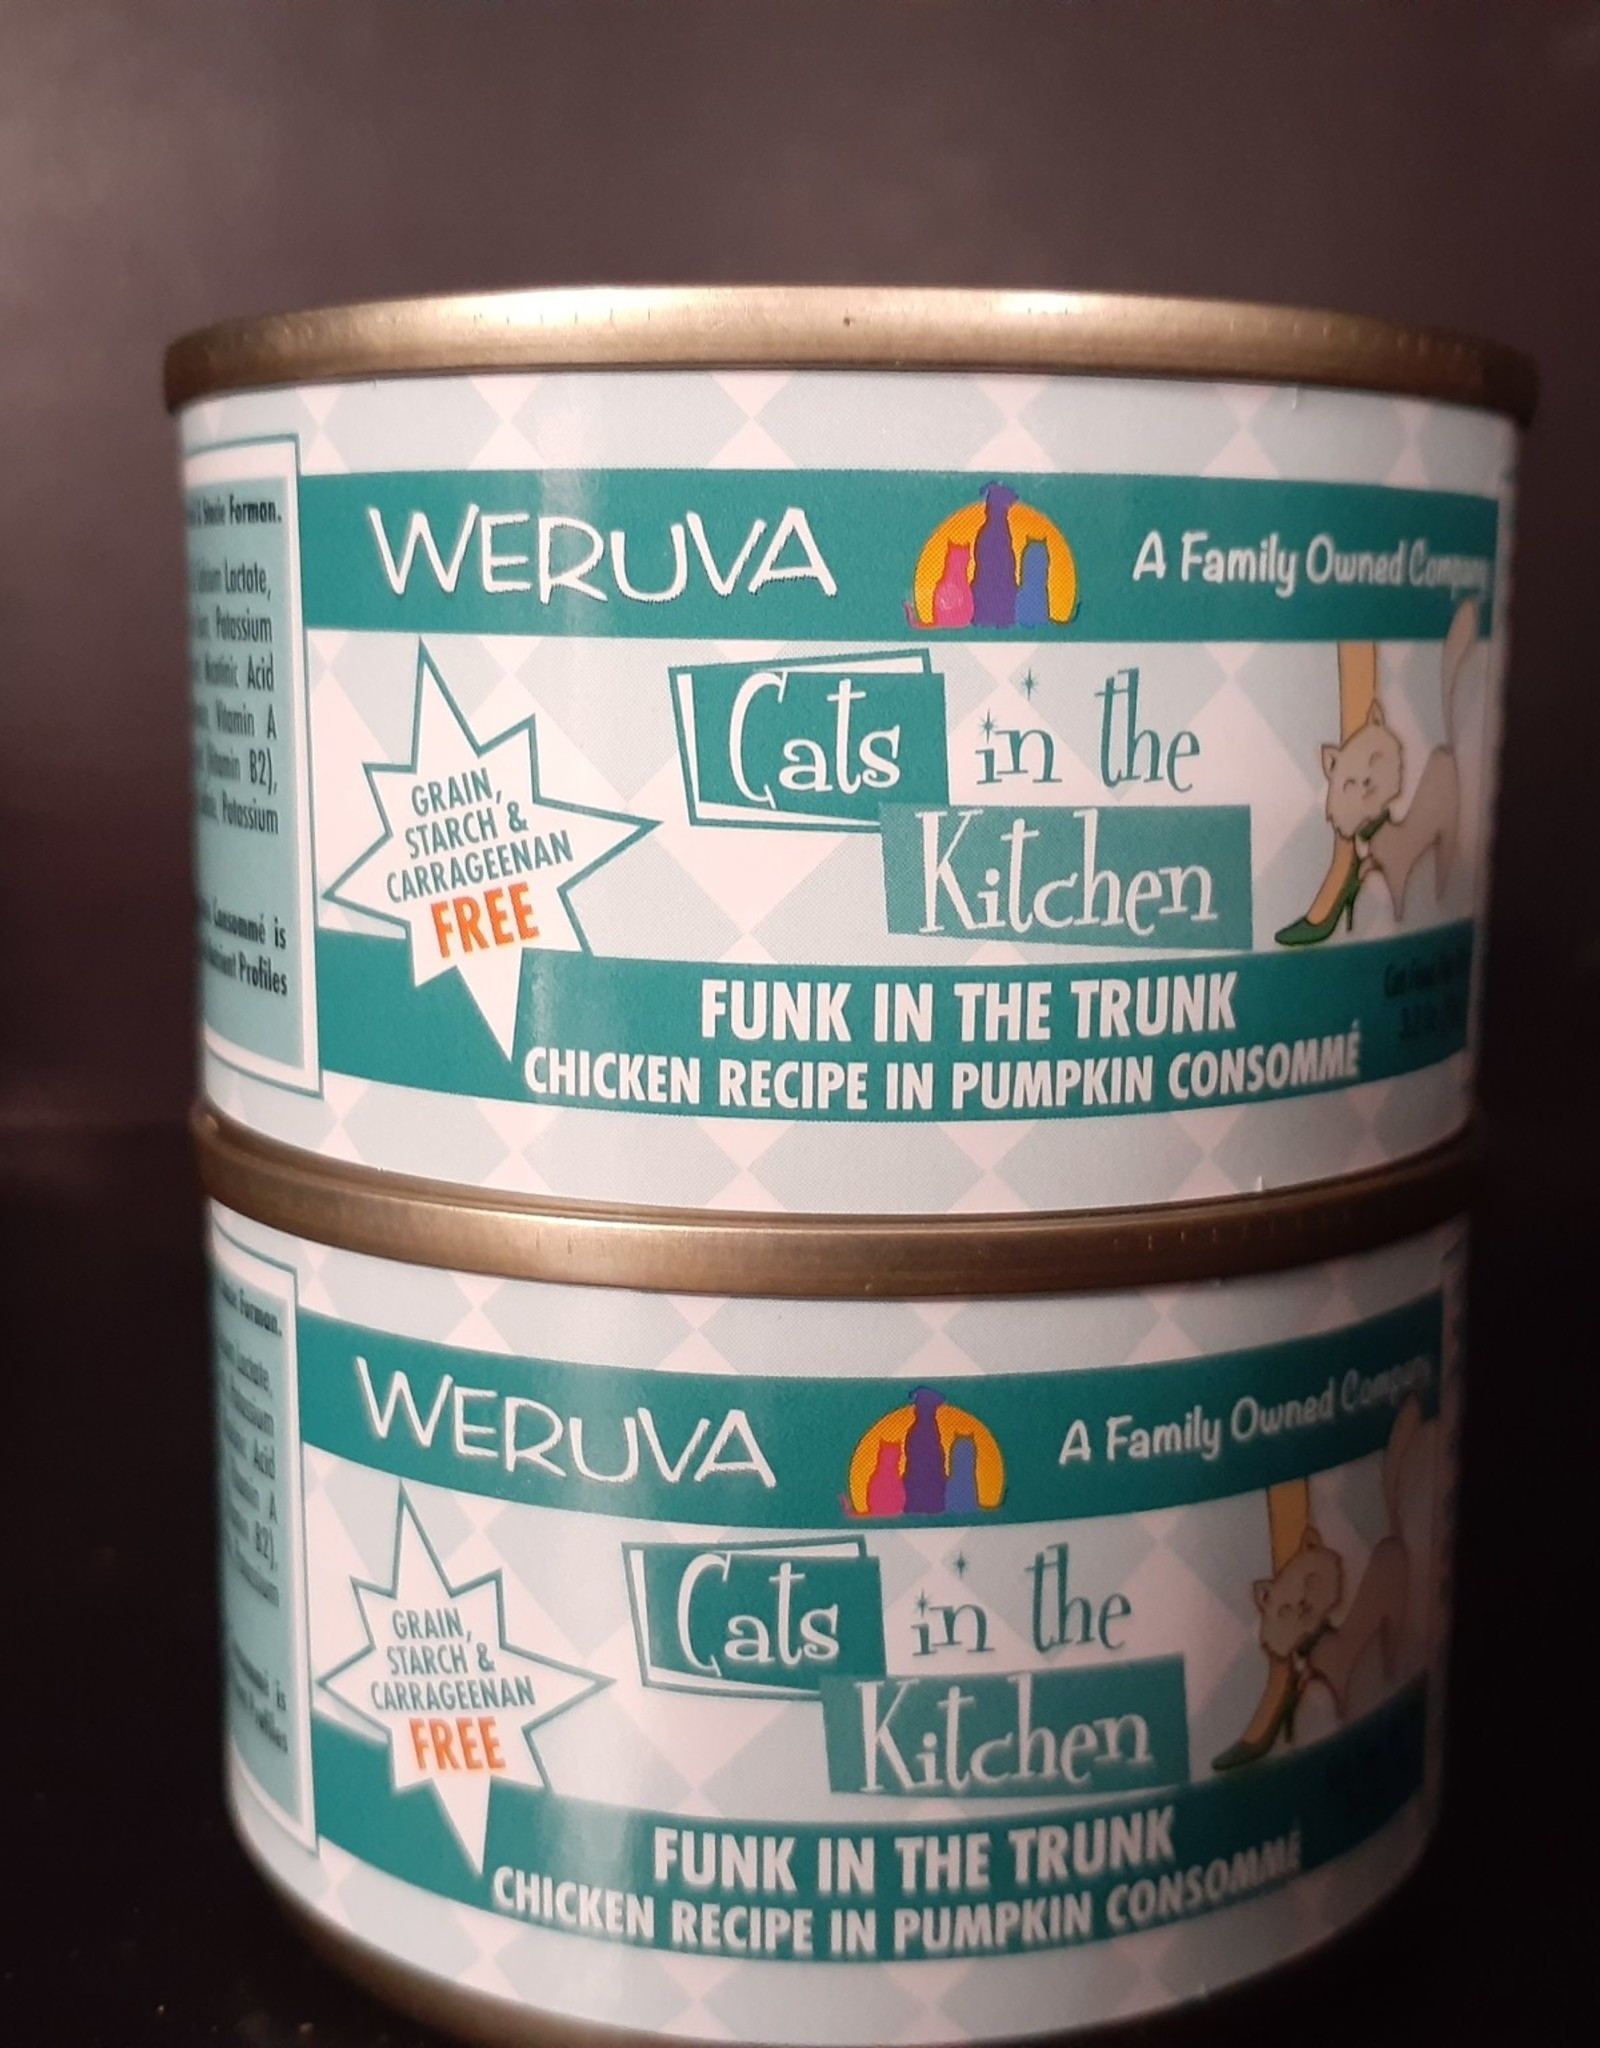 Weruva Weruva Cats in the Kitchen Funk in the Trunk